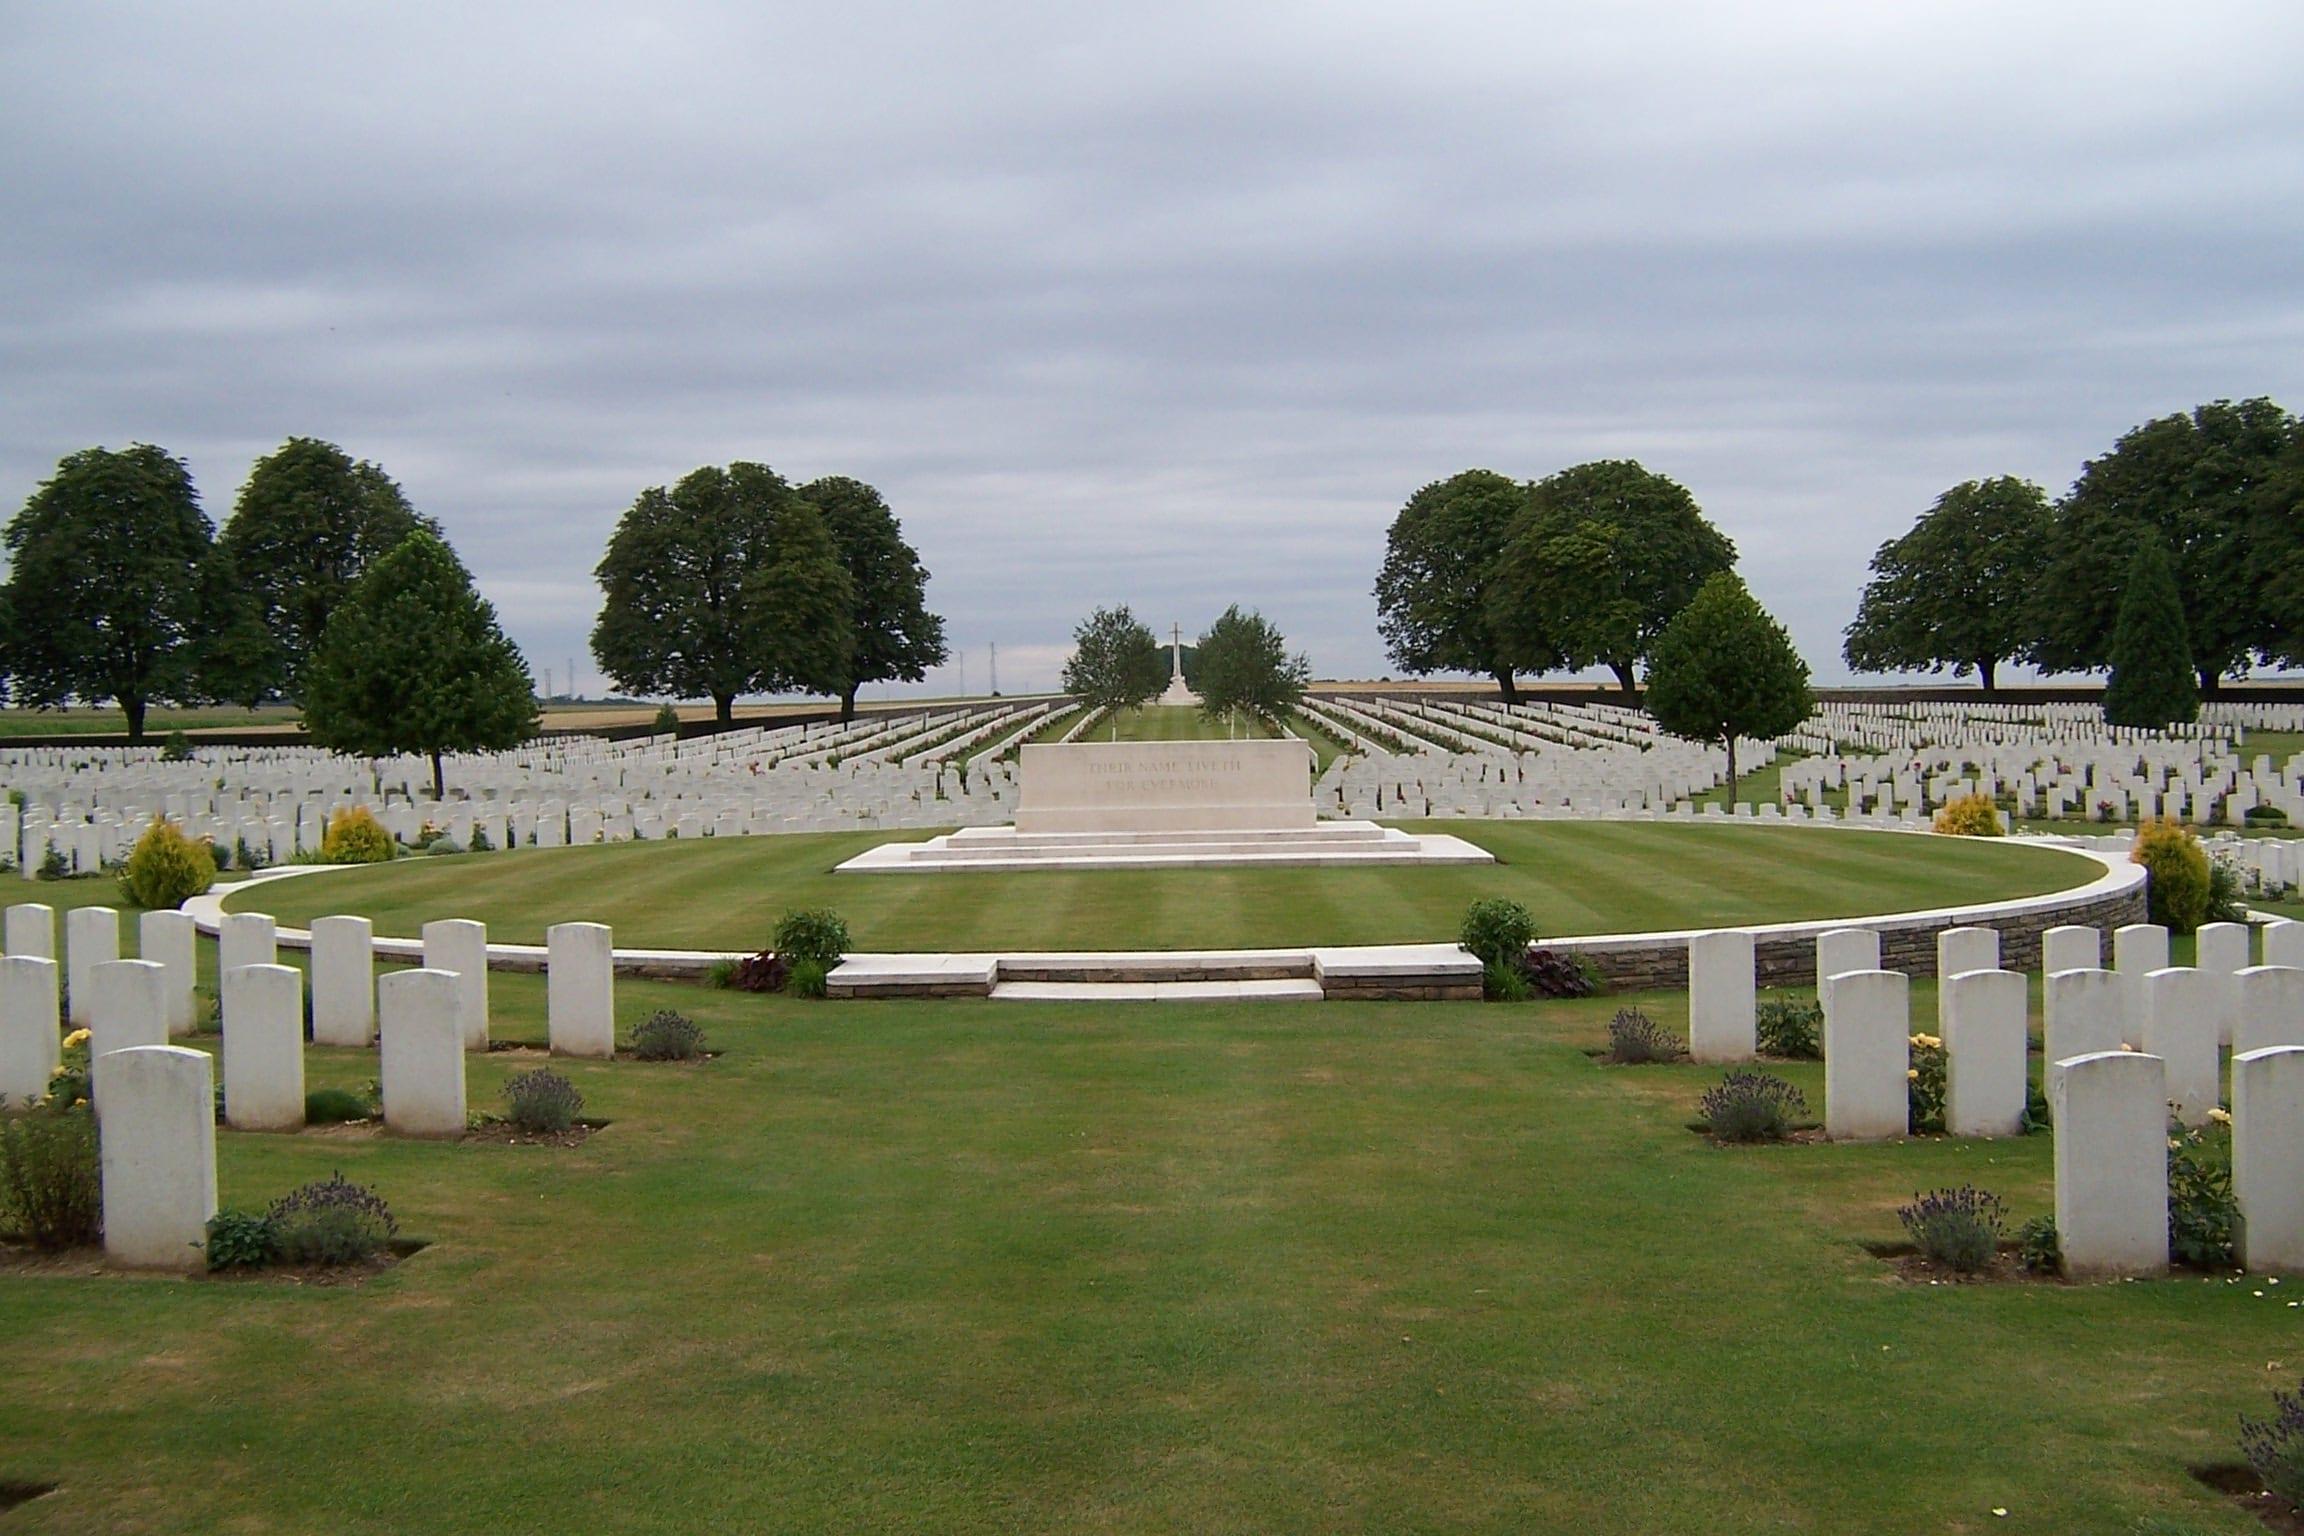 The Vimy Ridge War Cemetery